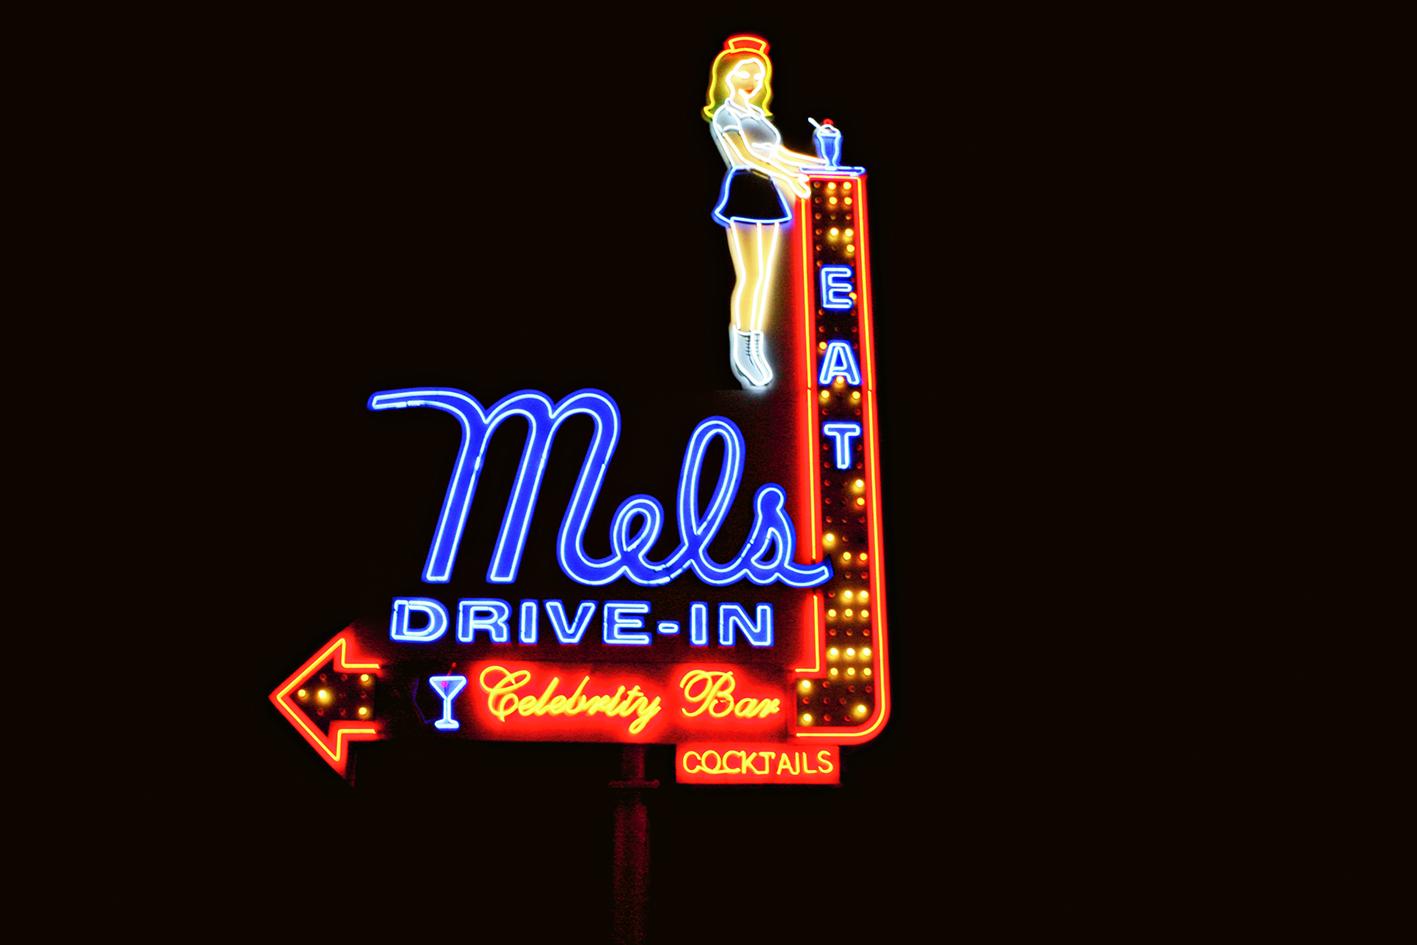 USA_Mels_drive